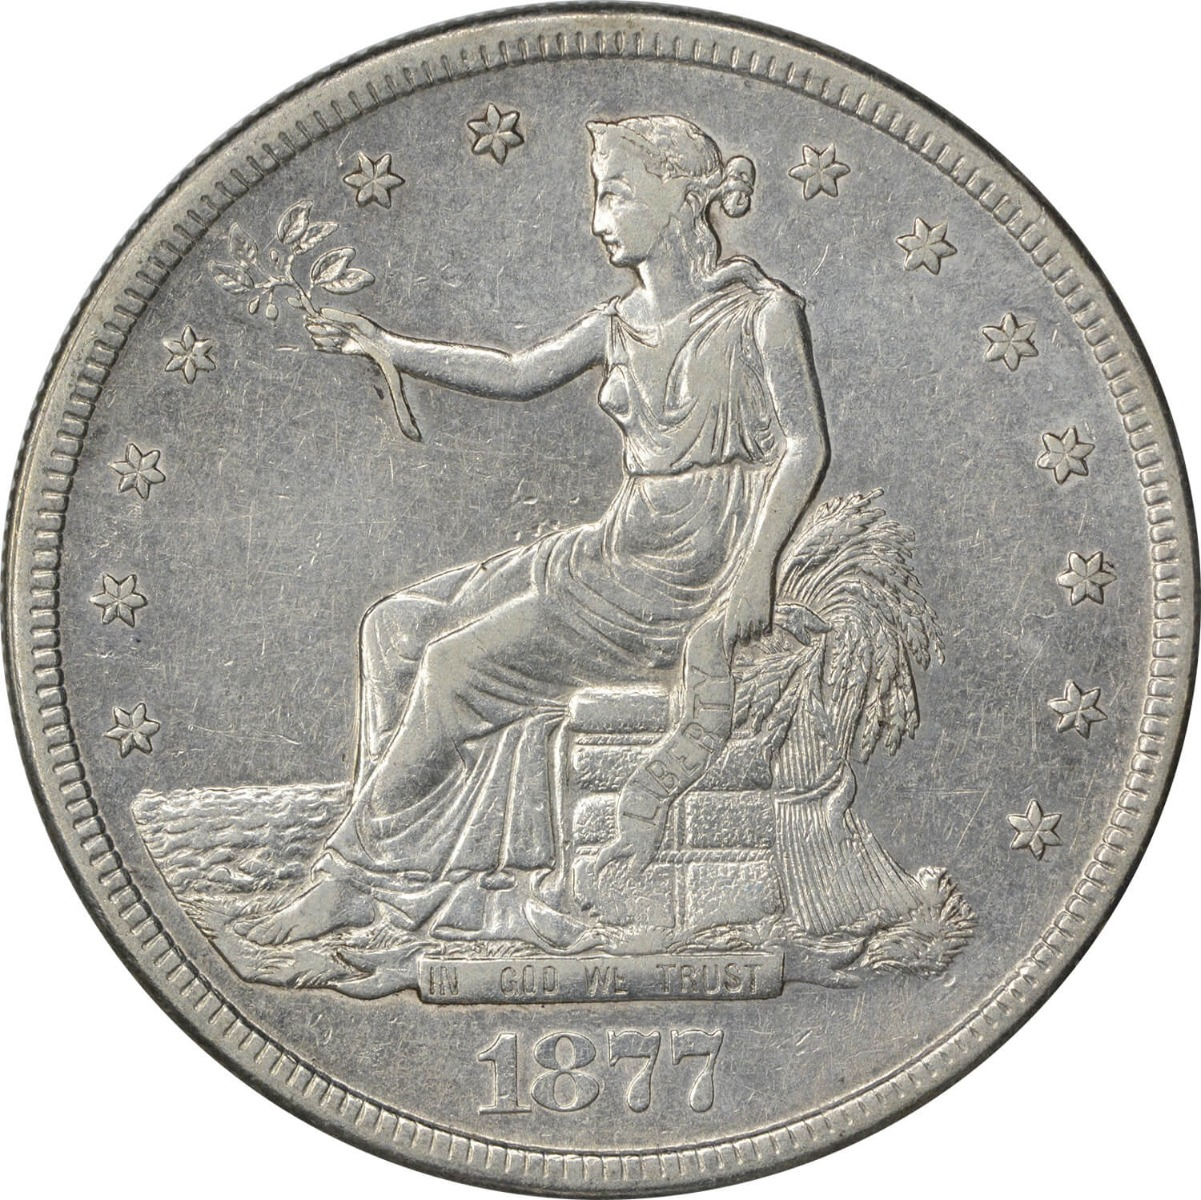 1877-S Trade Silver Dollar EF Uncertified